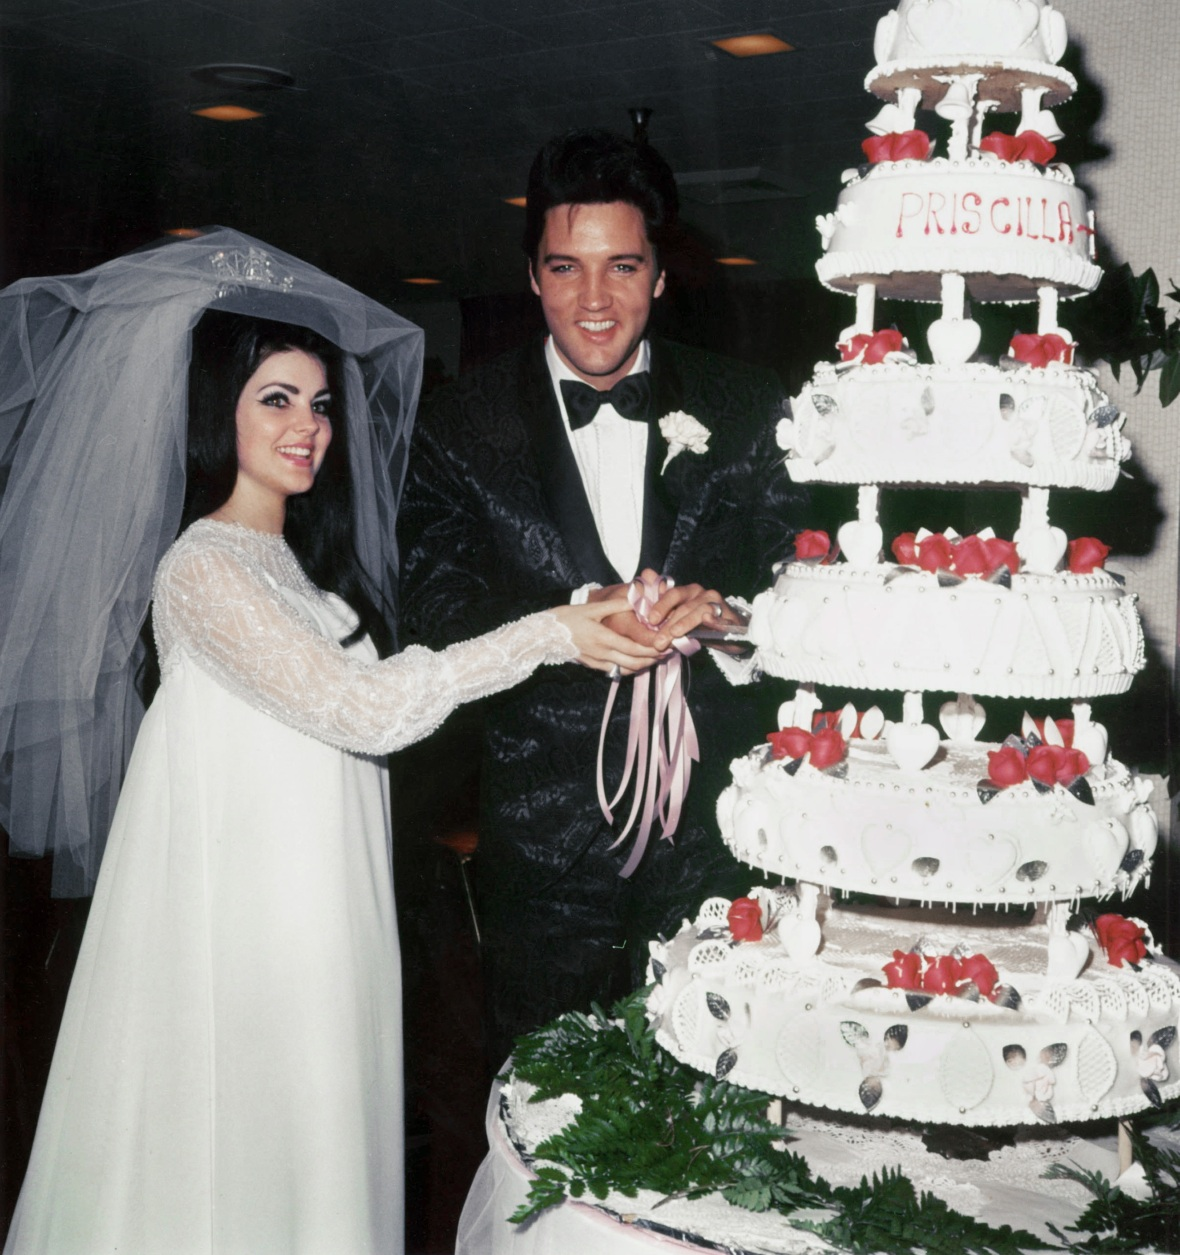 elvis presley wedding getty images